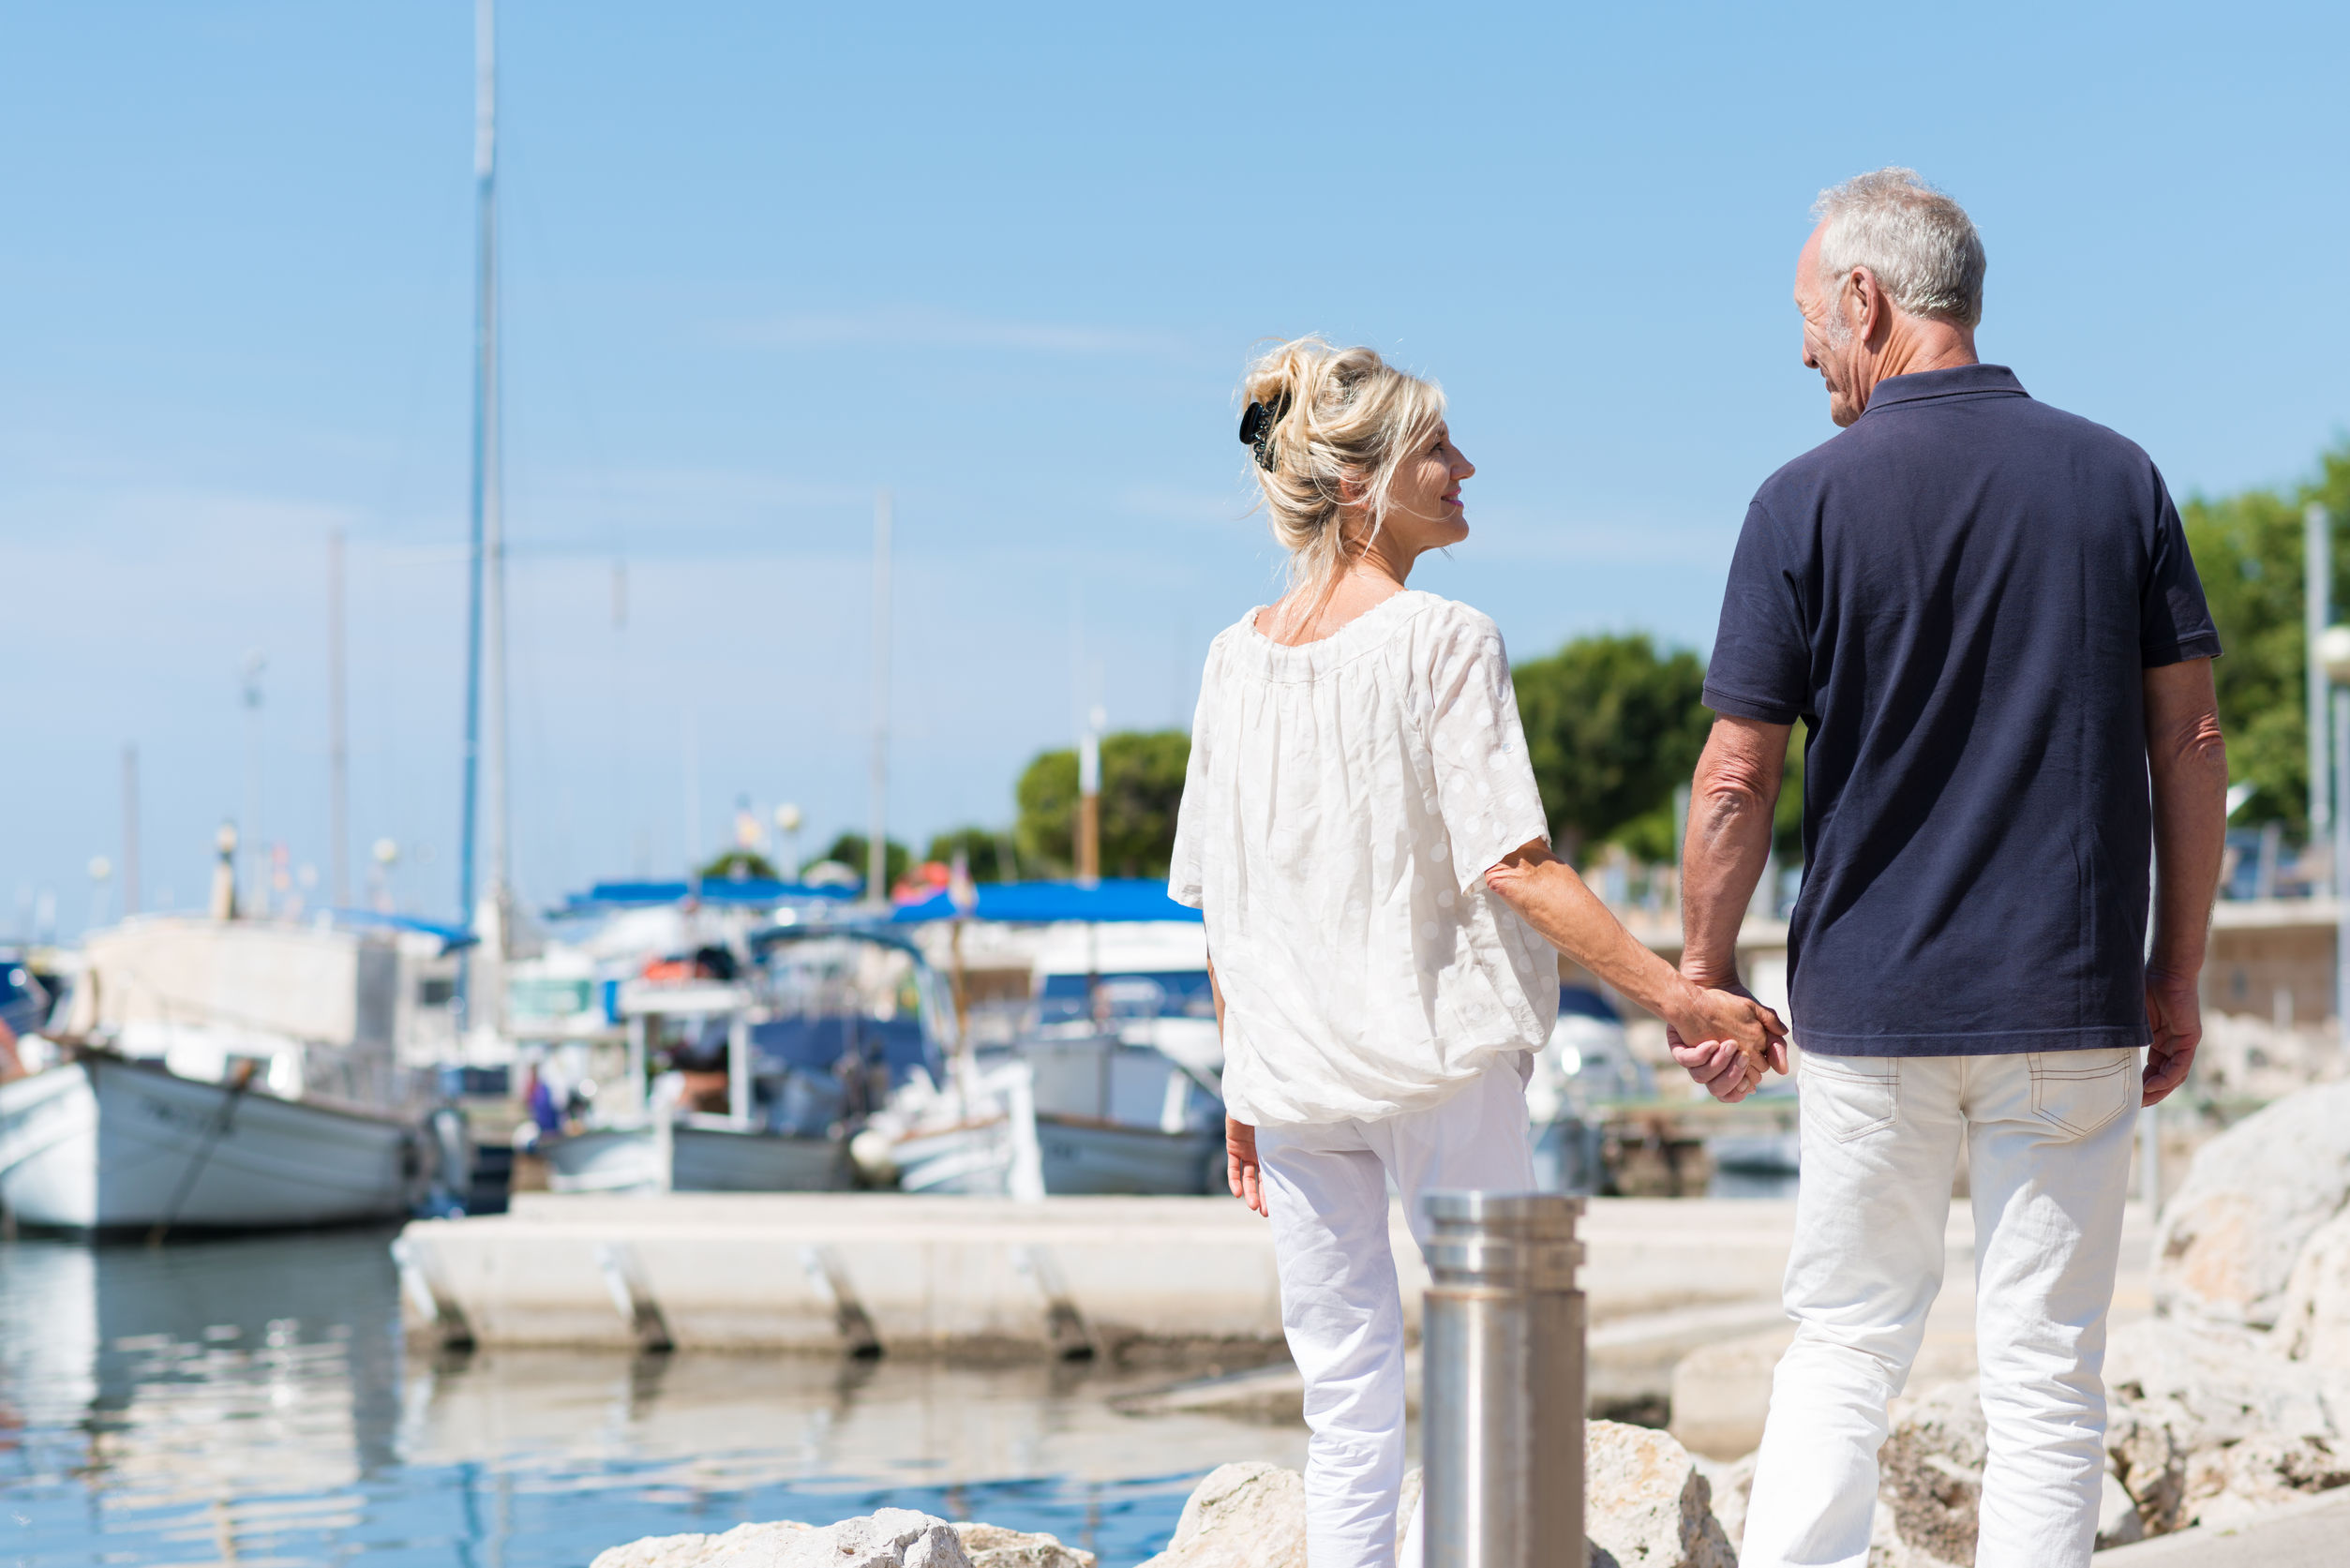 Leaving an inheritance no longer a consideration for seniors